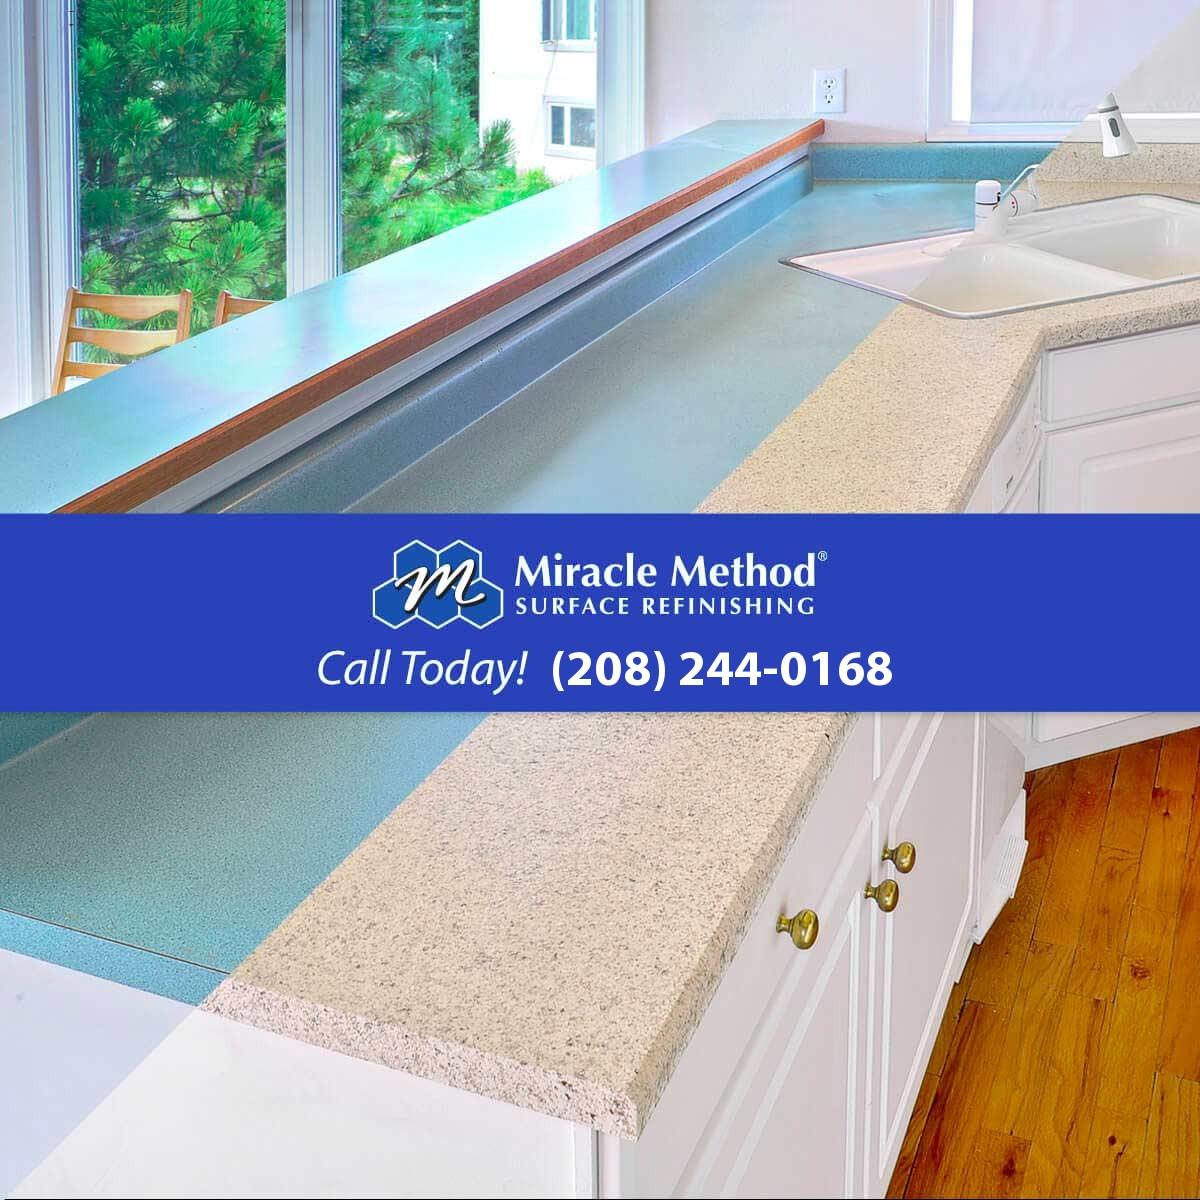 Fiberglass Tub Repair Meridian, ID | Miracle Method of Boise